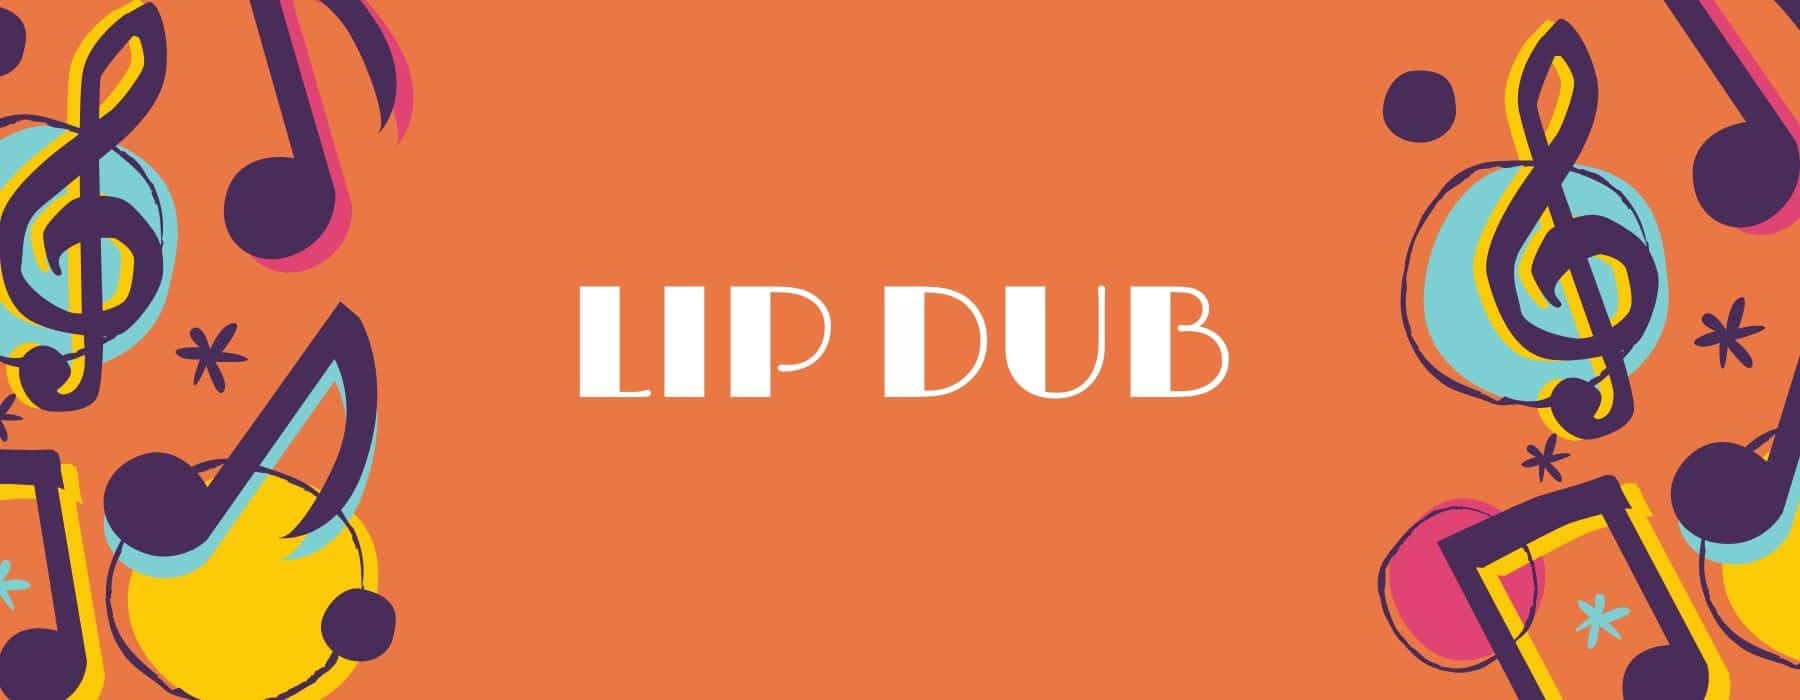 TEAM BUILDING lip dub